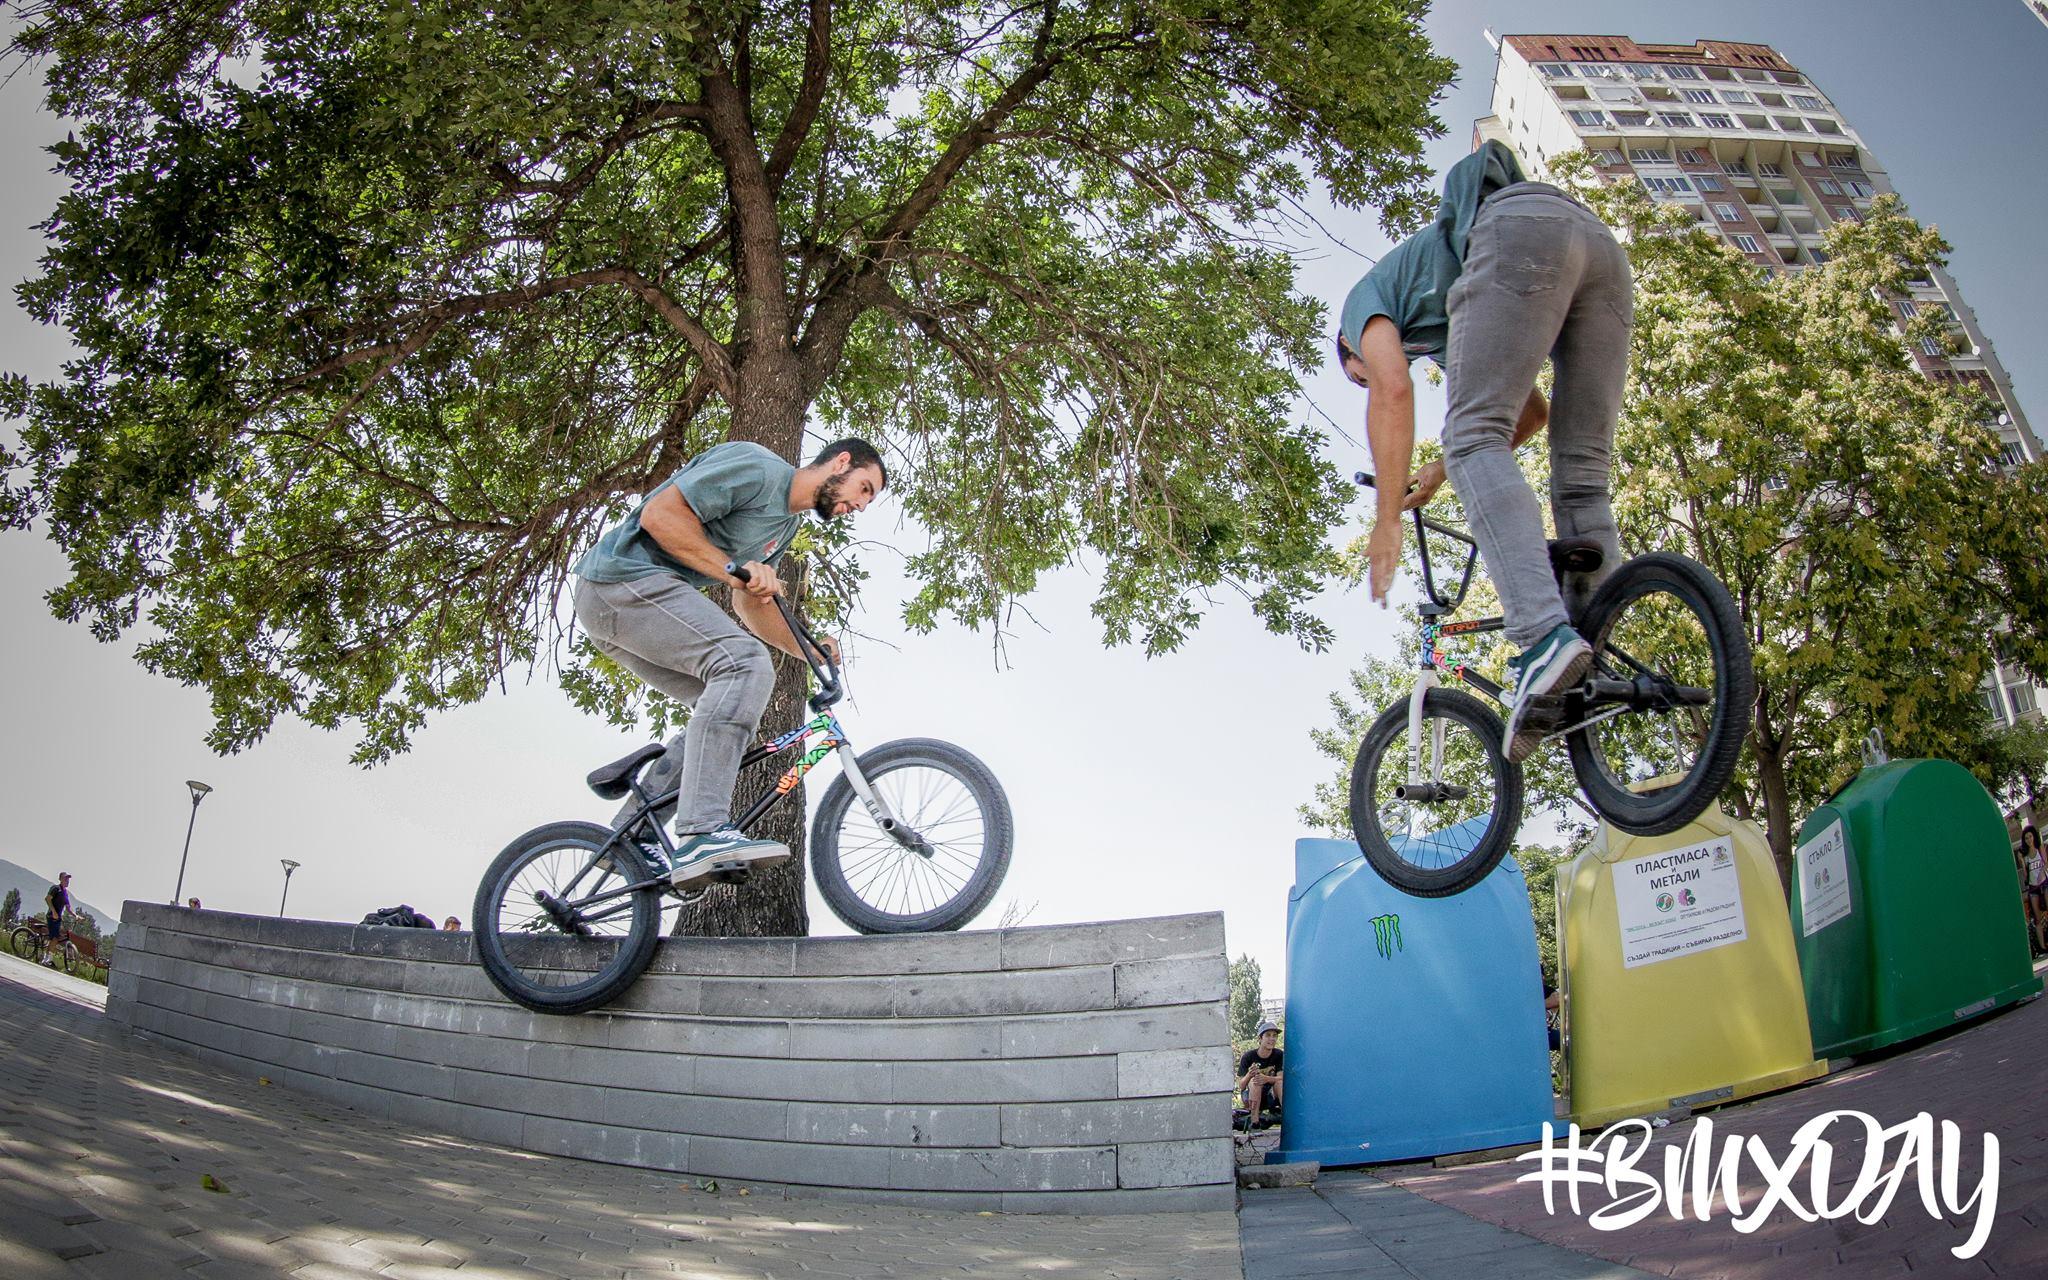 BMX DAY - снимки и видео